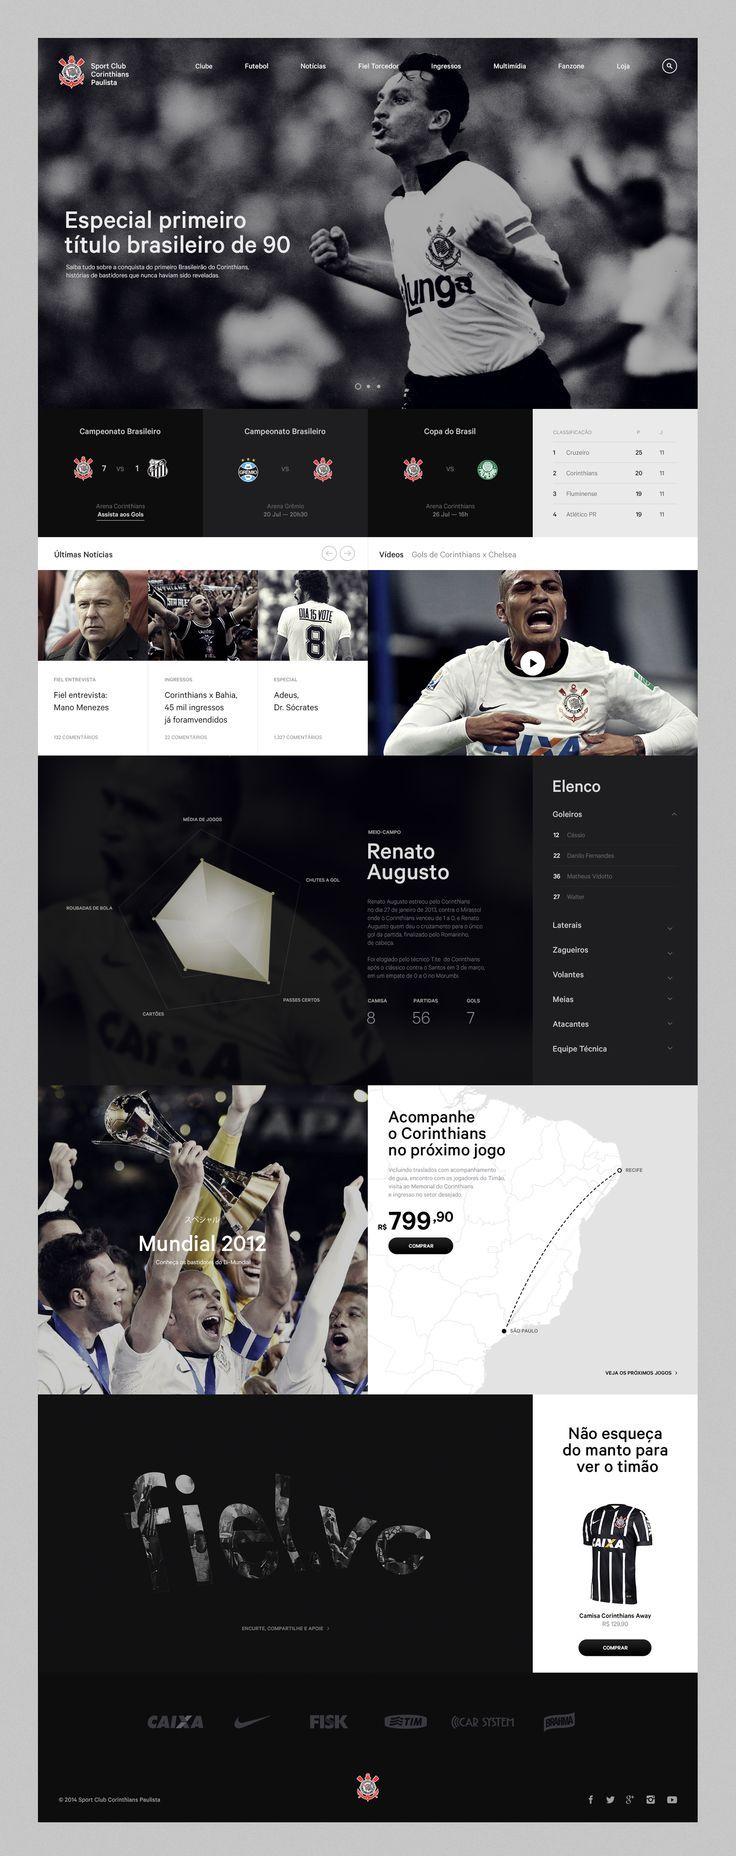 Corinthians - Danilo Campos — Designer & Art Director. If you like UX, design, or design thinking, check out theuxblog.com